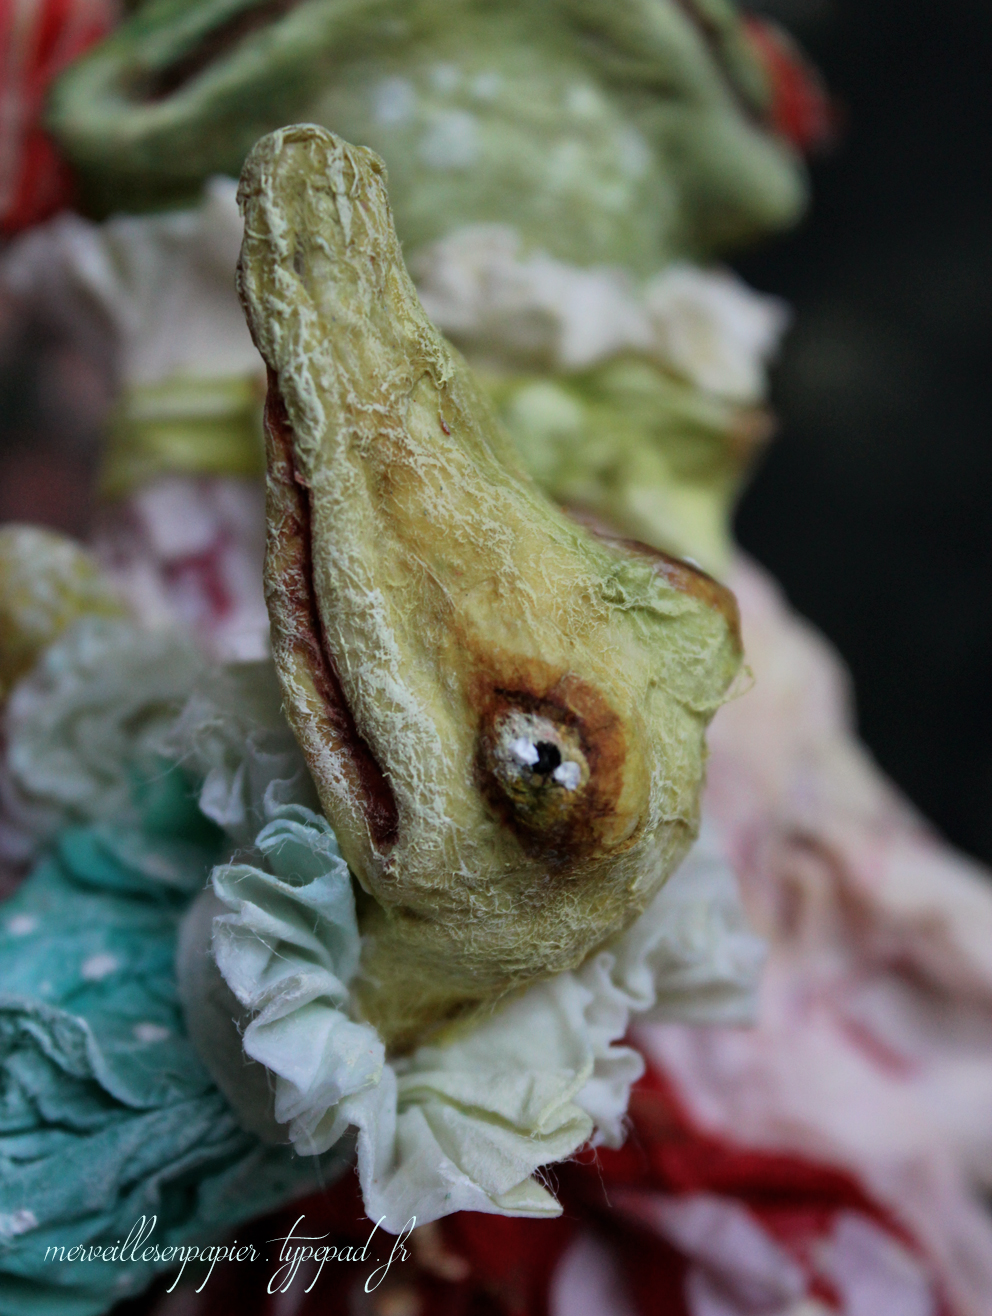 enfant-grenouille-croco-11.jpg